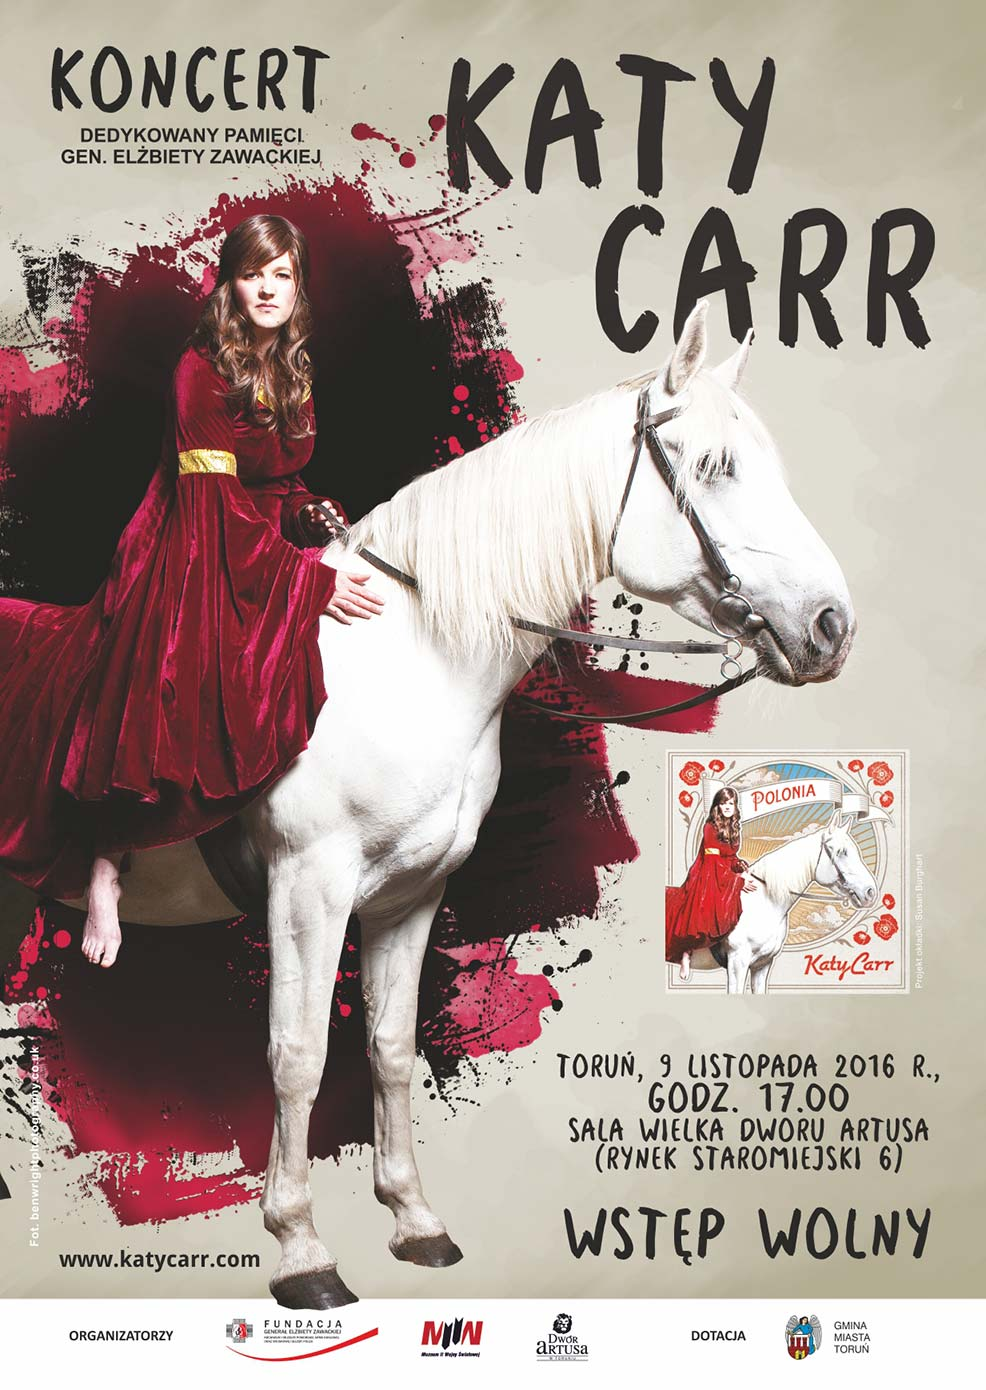 katy-carr-torun-concert-9th-nov-2016